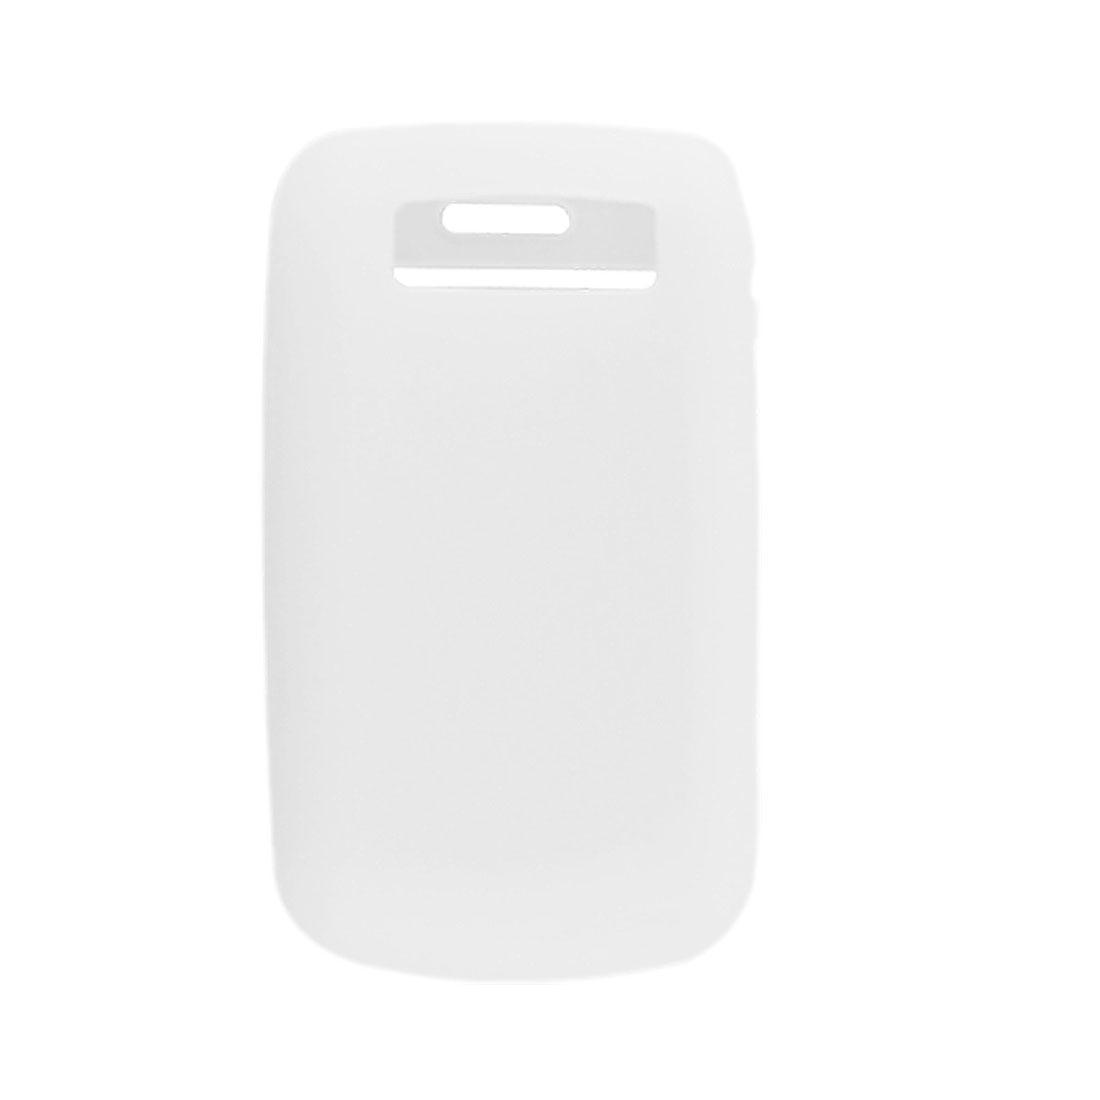 White Silicone Skin Case Screen Guard for Blackberry Bold 9700